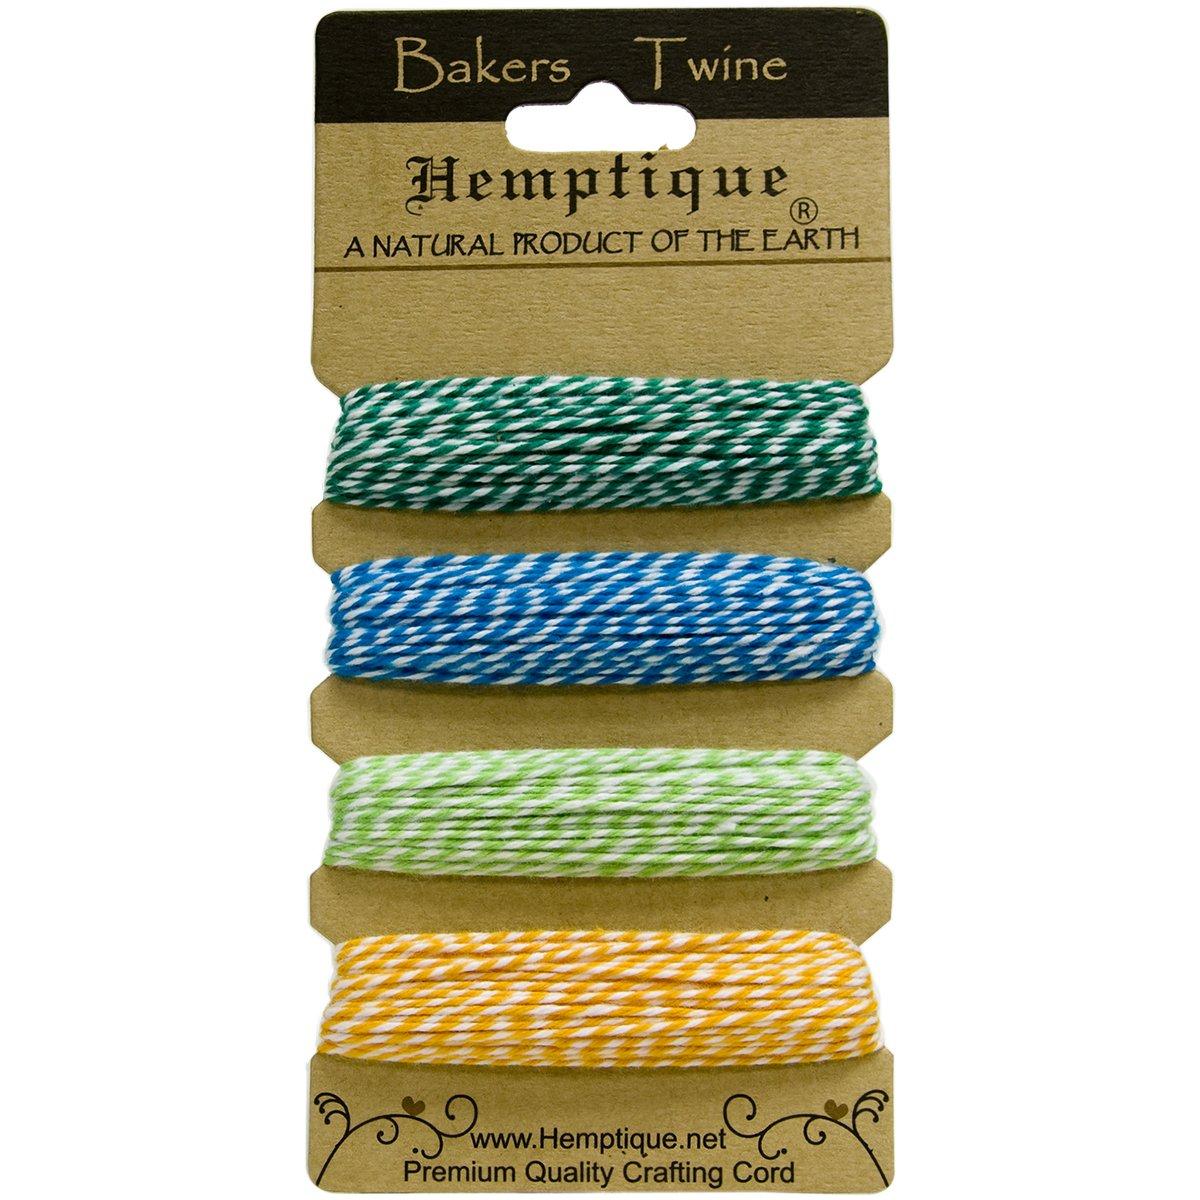 120 Hemptique Cotton Bakers 2-Ply Twine btc2tf Tutti-Frutti 120/' Trade Marker Inc